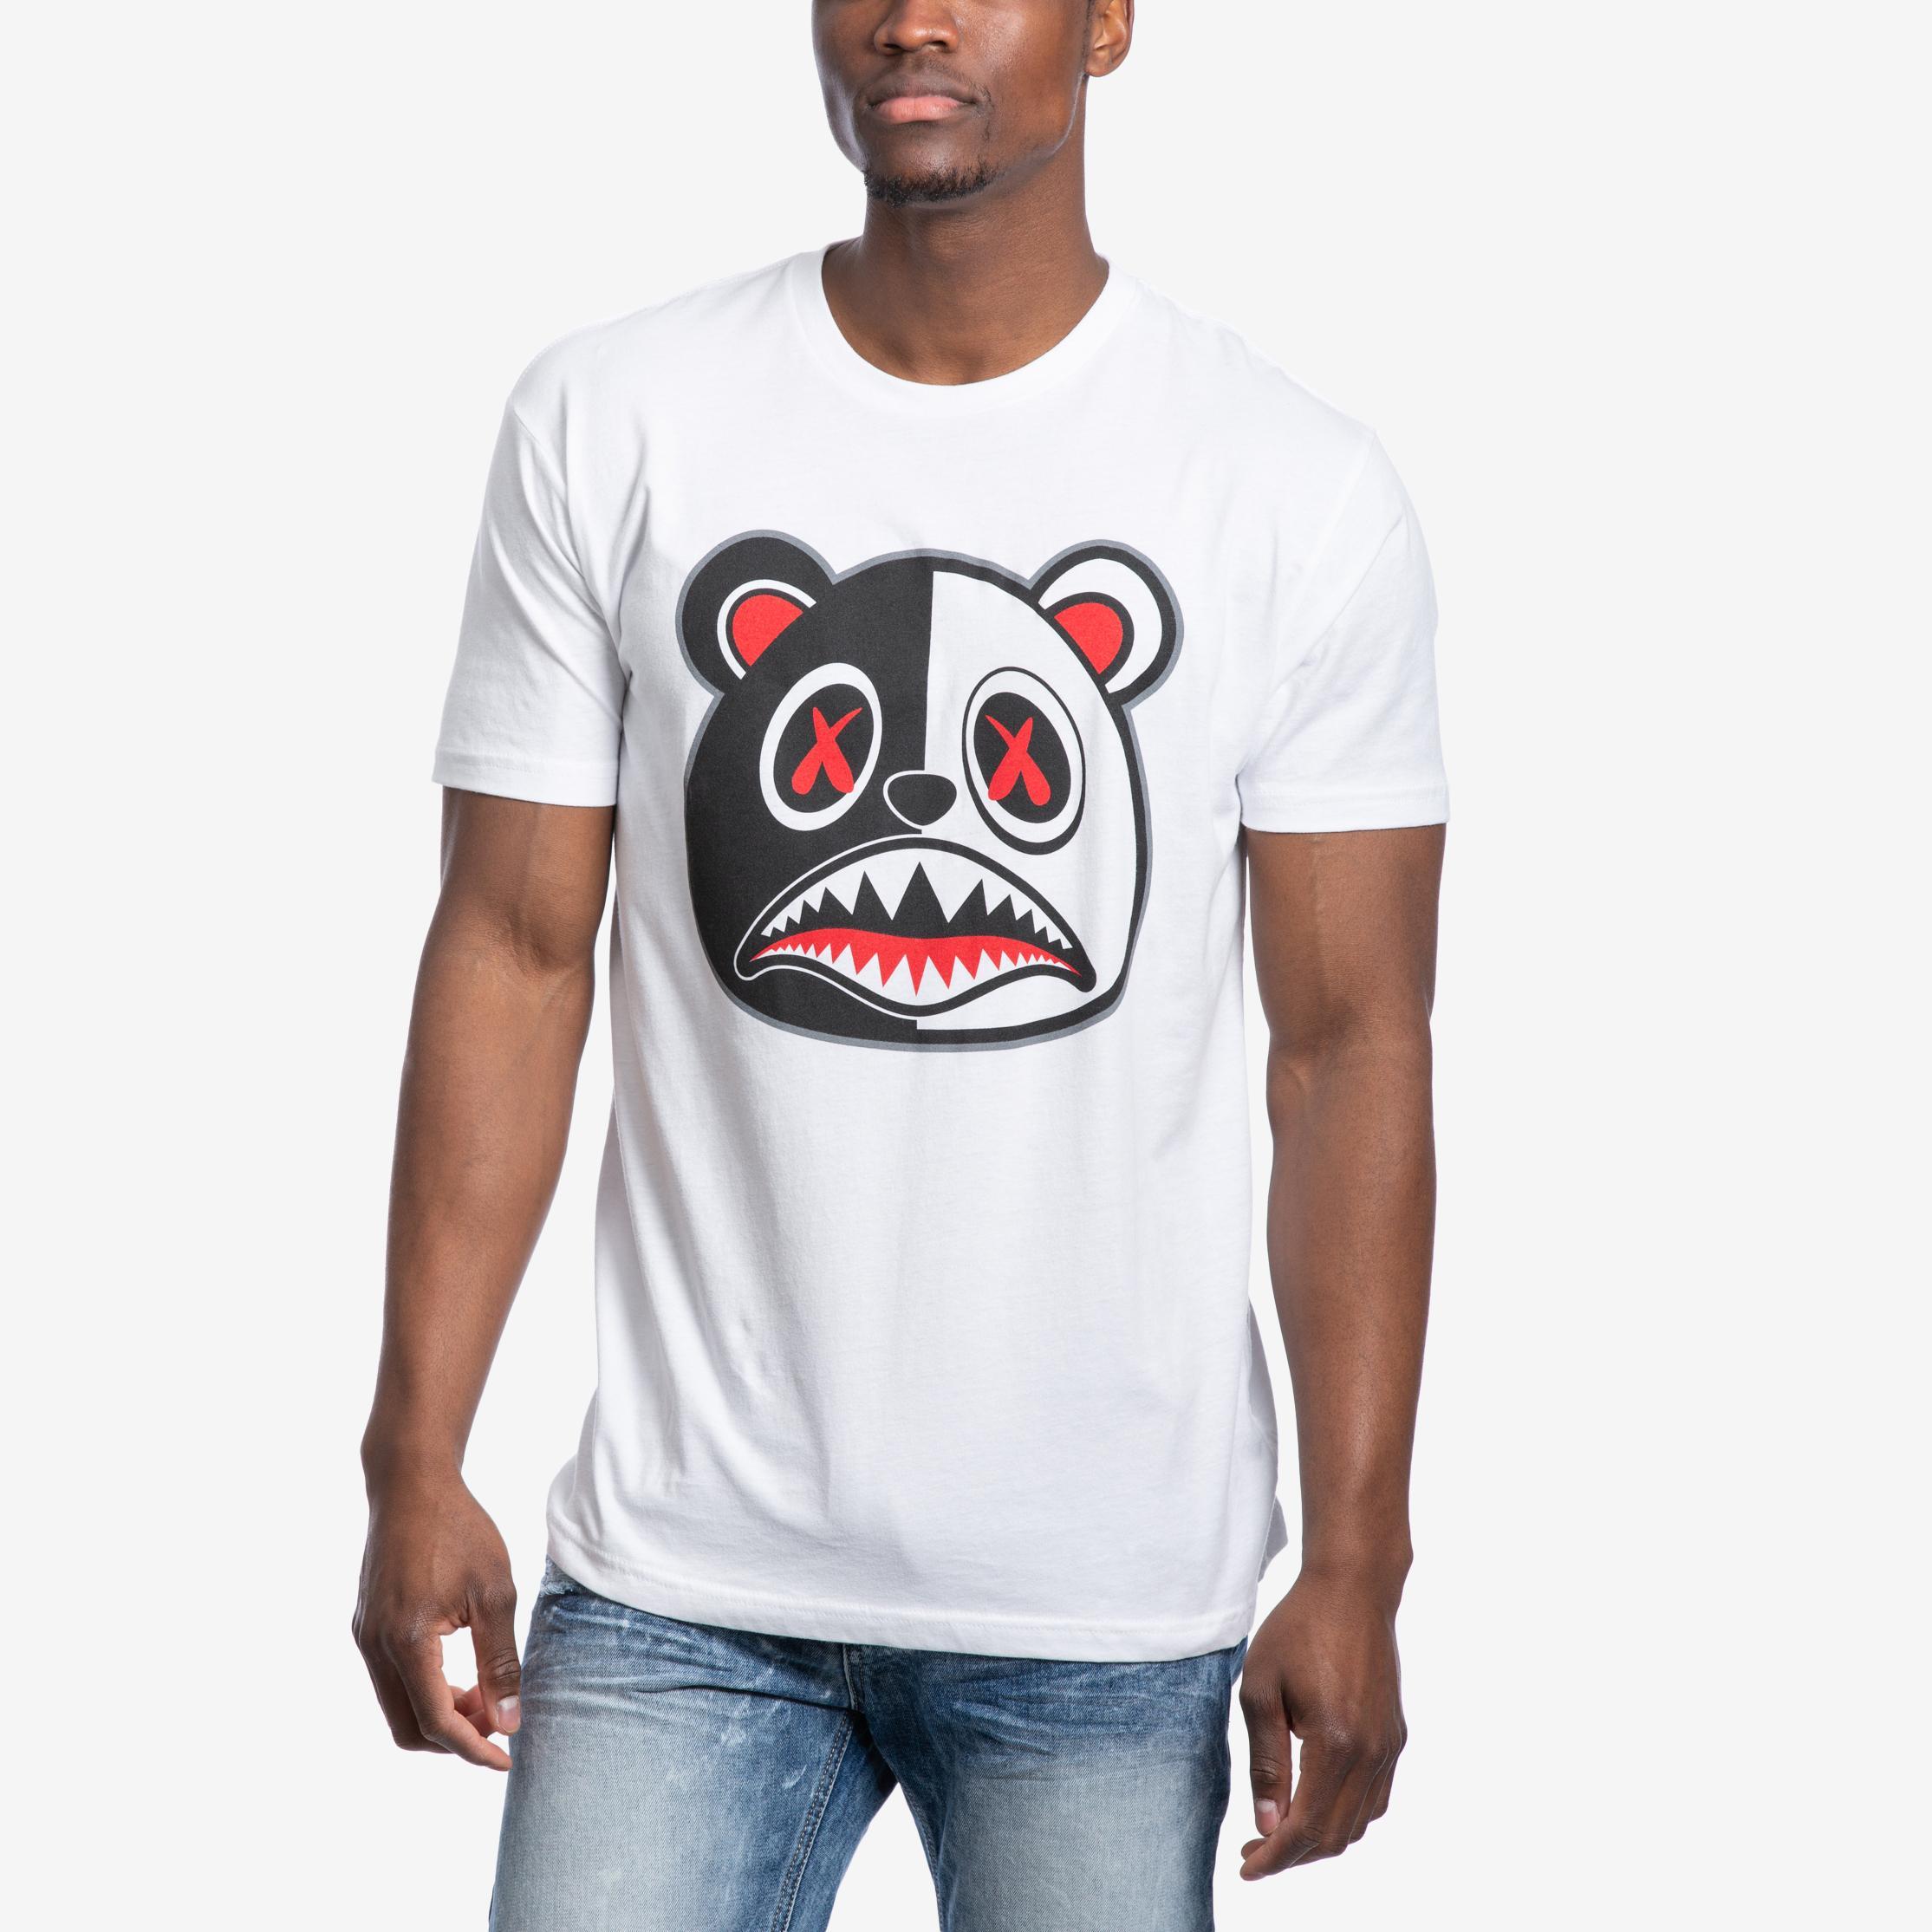 Scar Baws T- Shirt